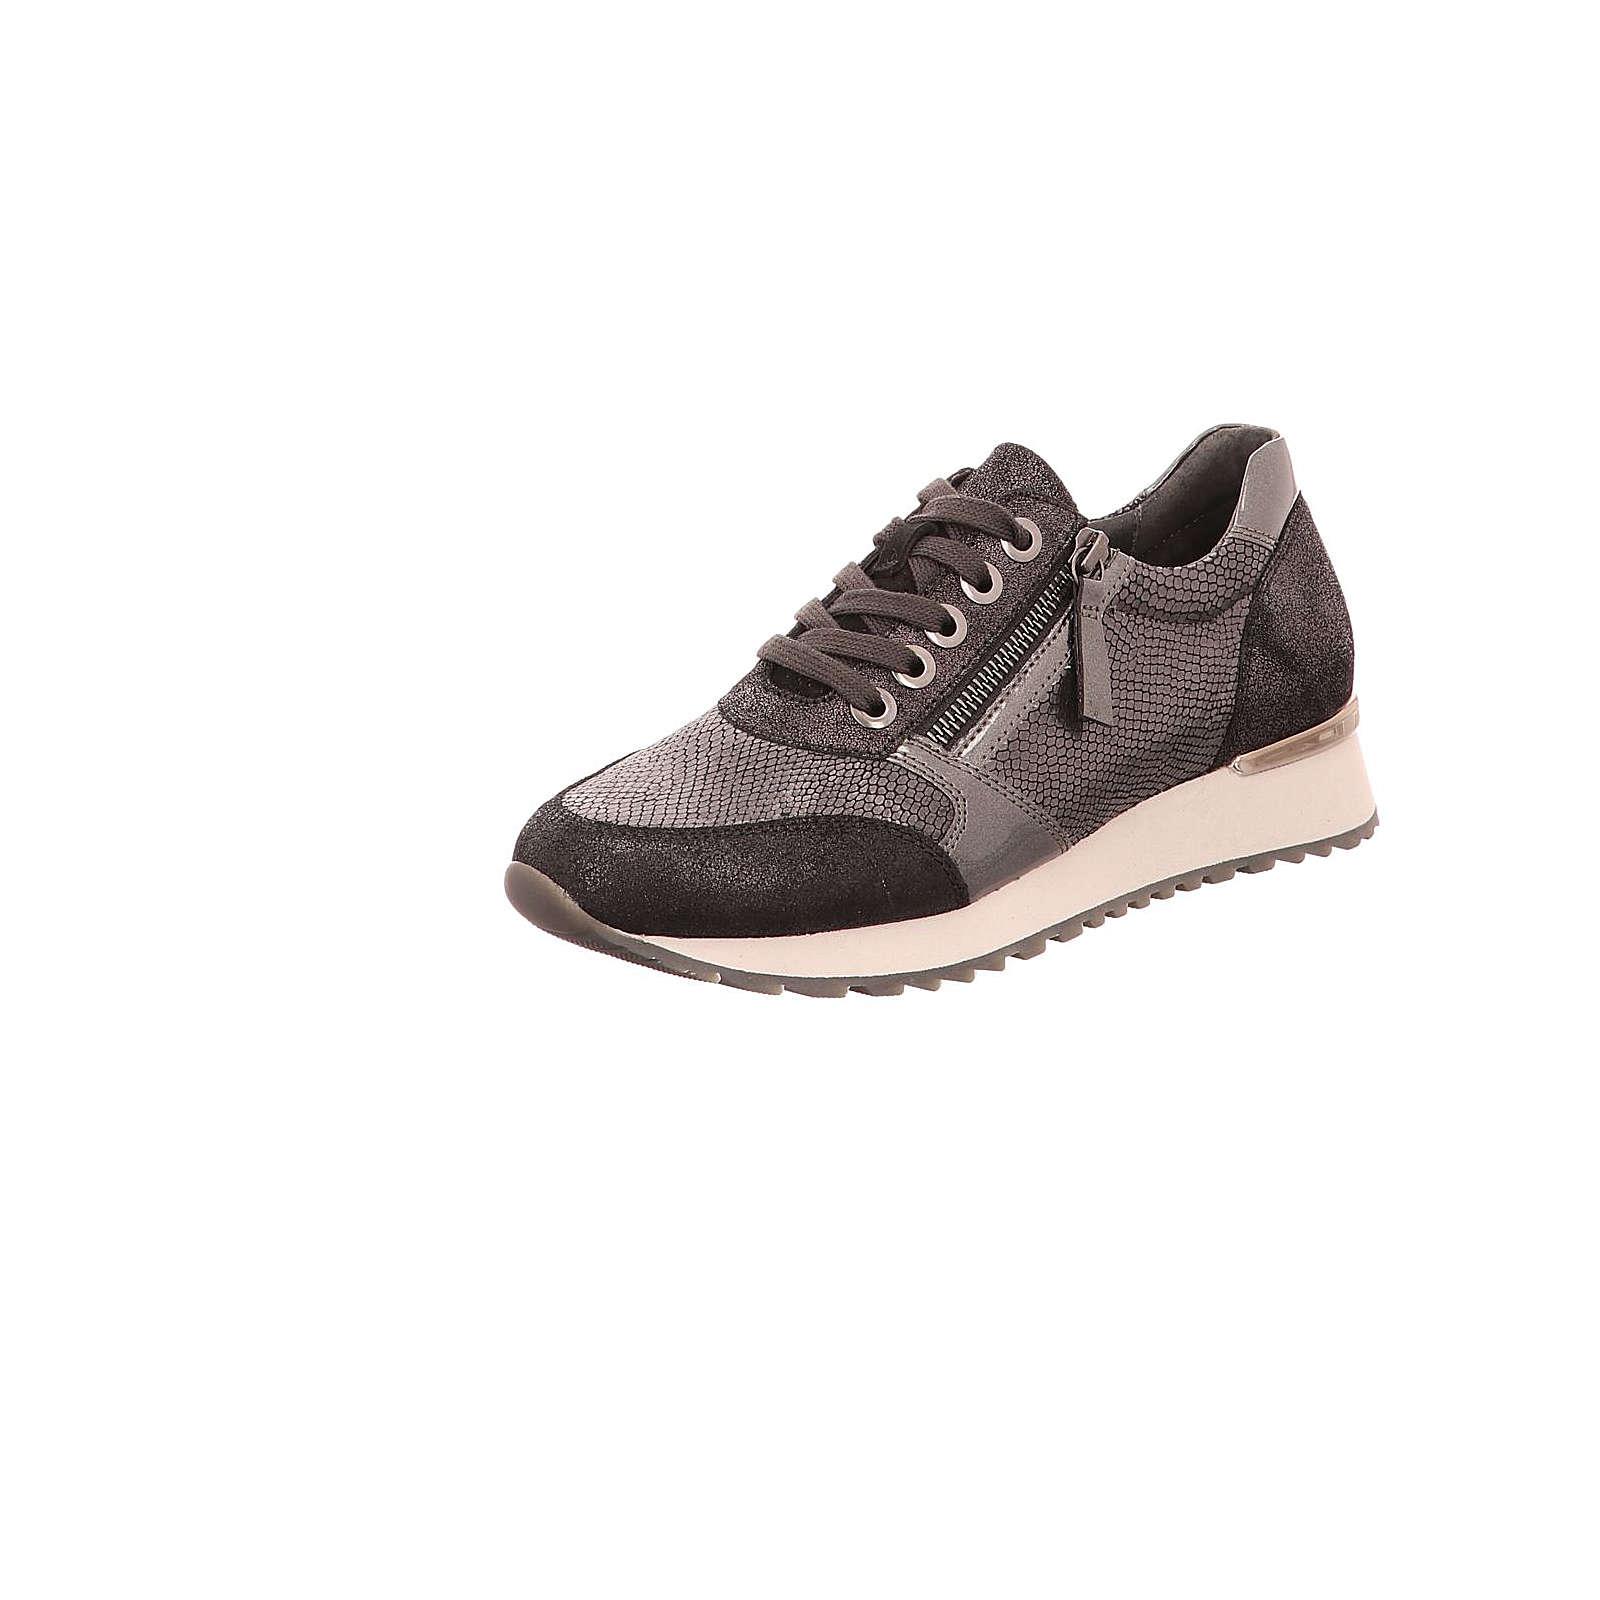 Gabor Sneakers Low braun Damen Gr. 38,5